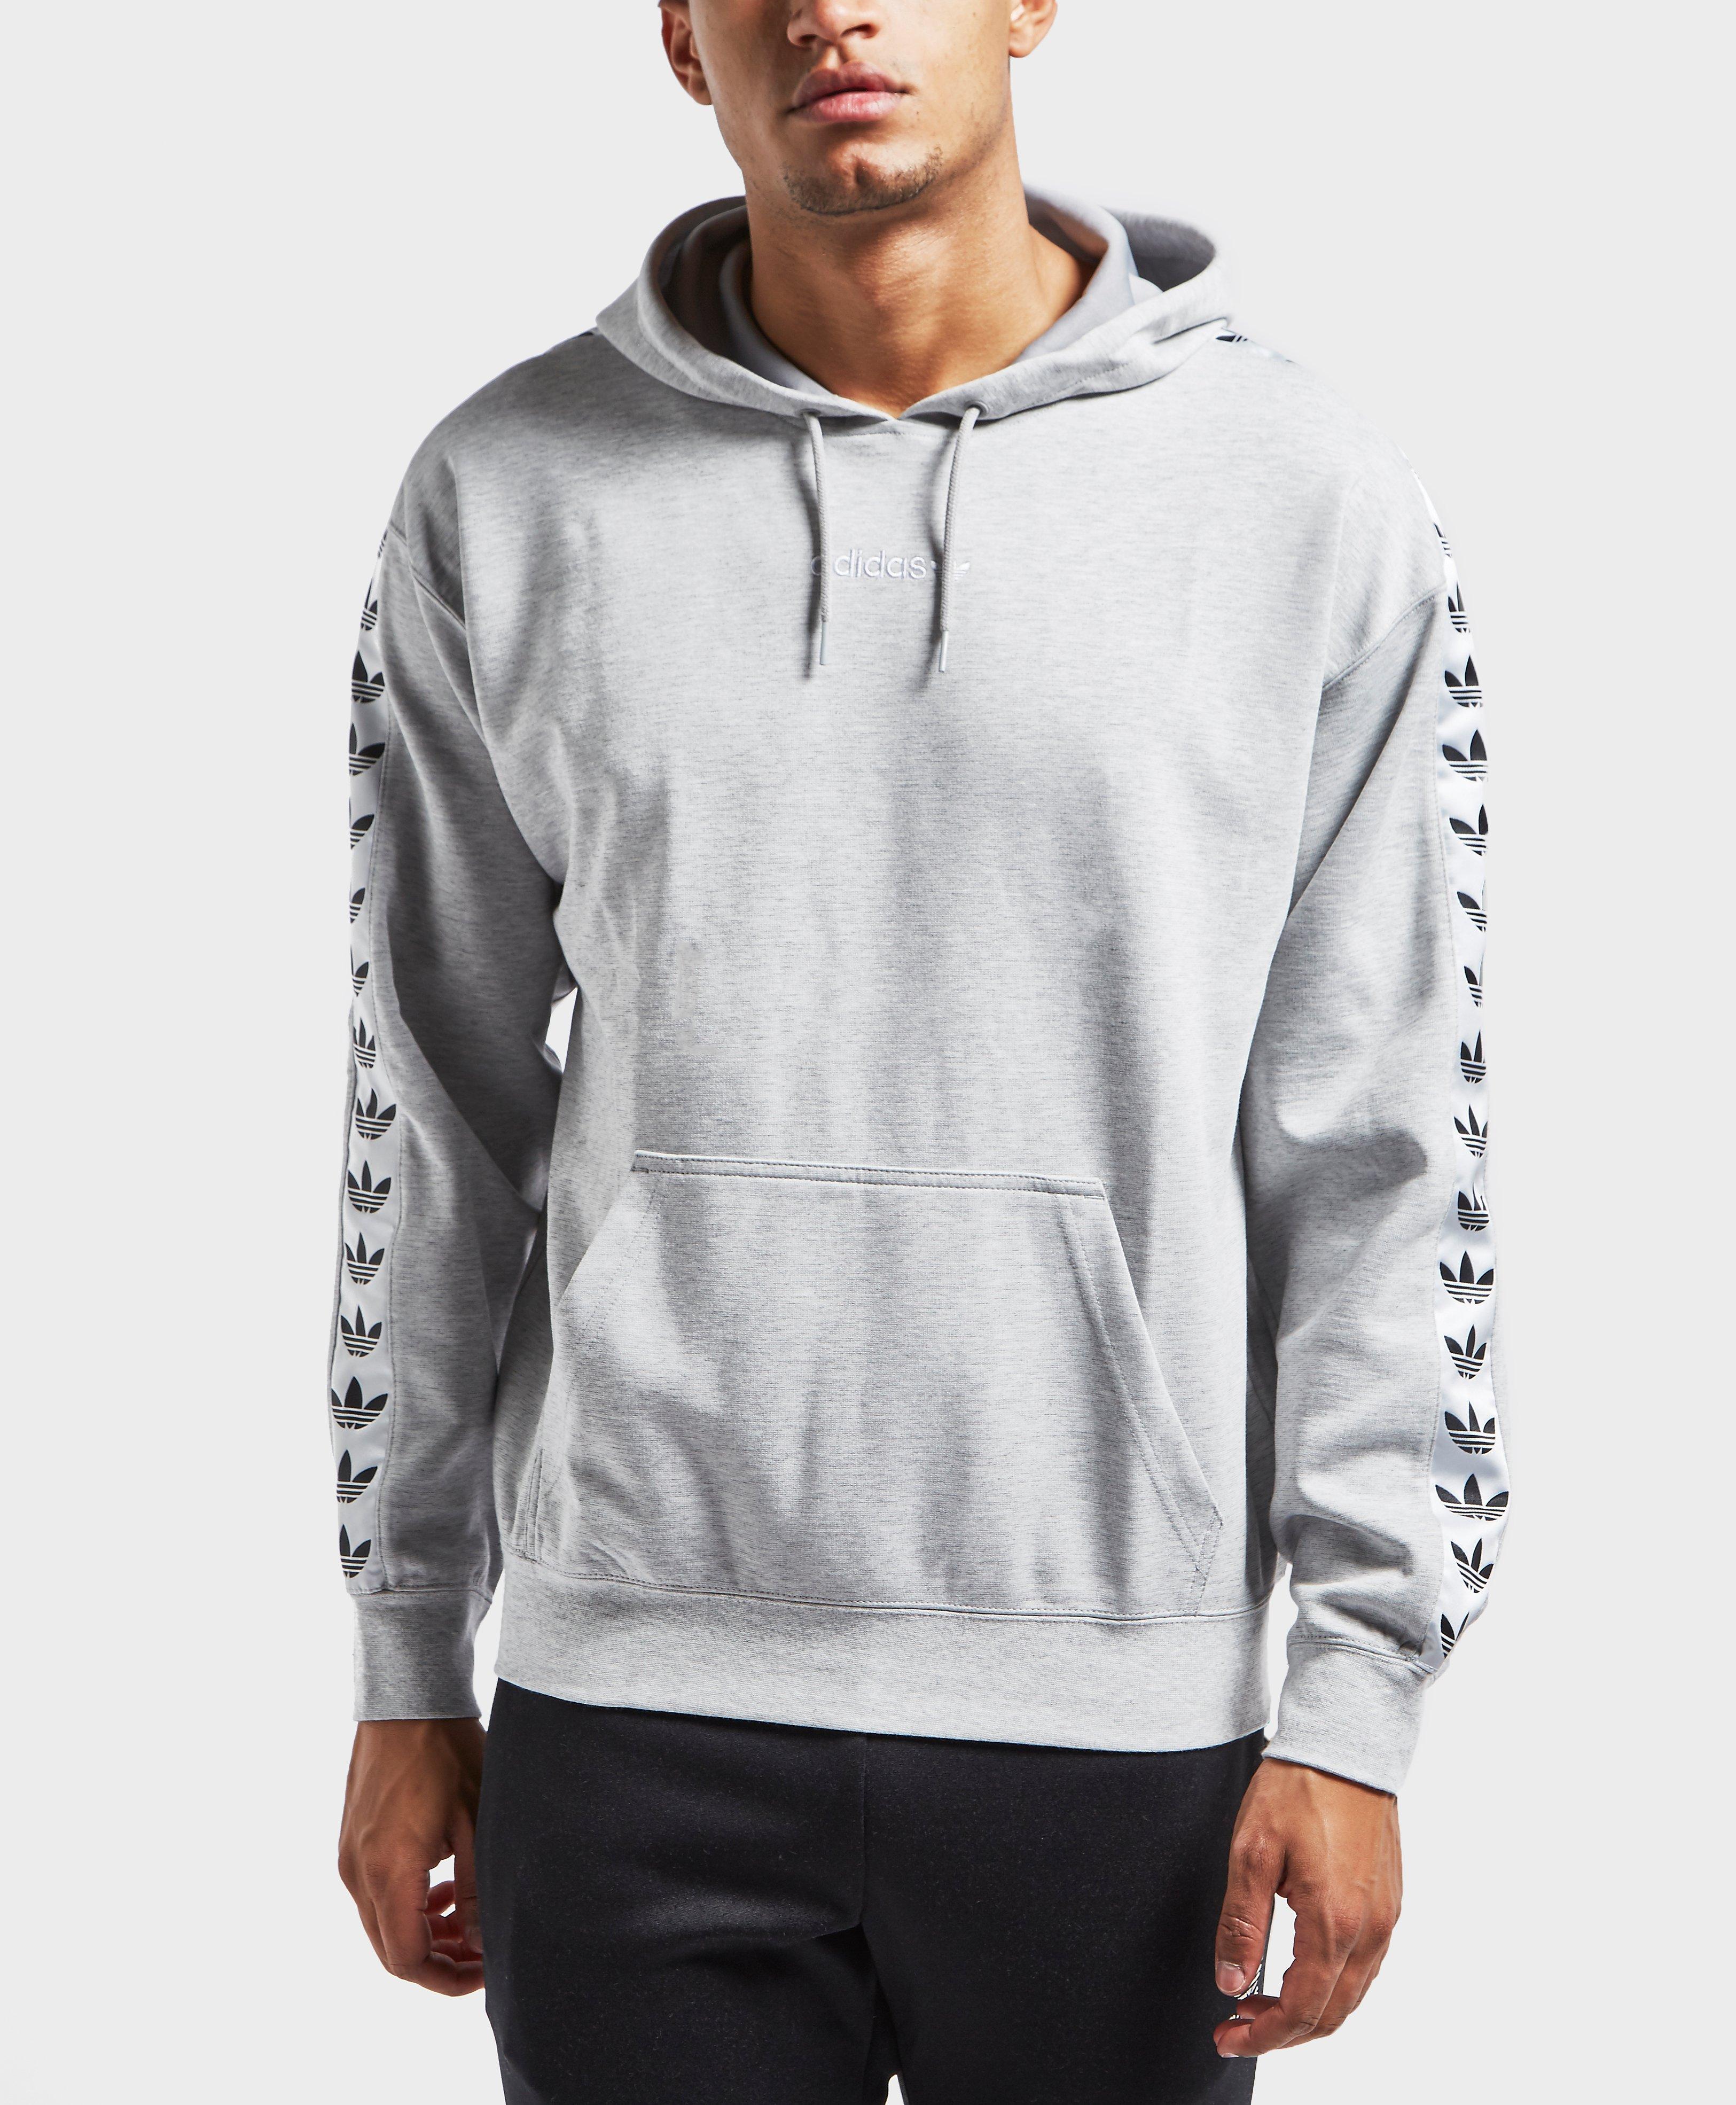 fb9fbeccb872 Lyst - adidas Originals Tape Overhead Hoodie in Gray for Men